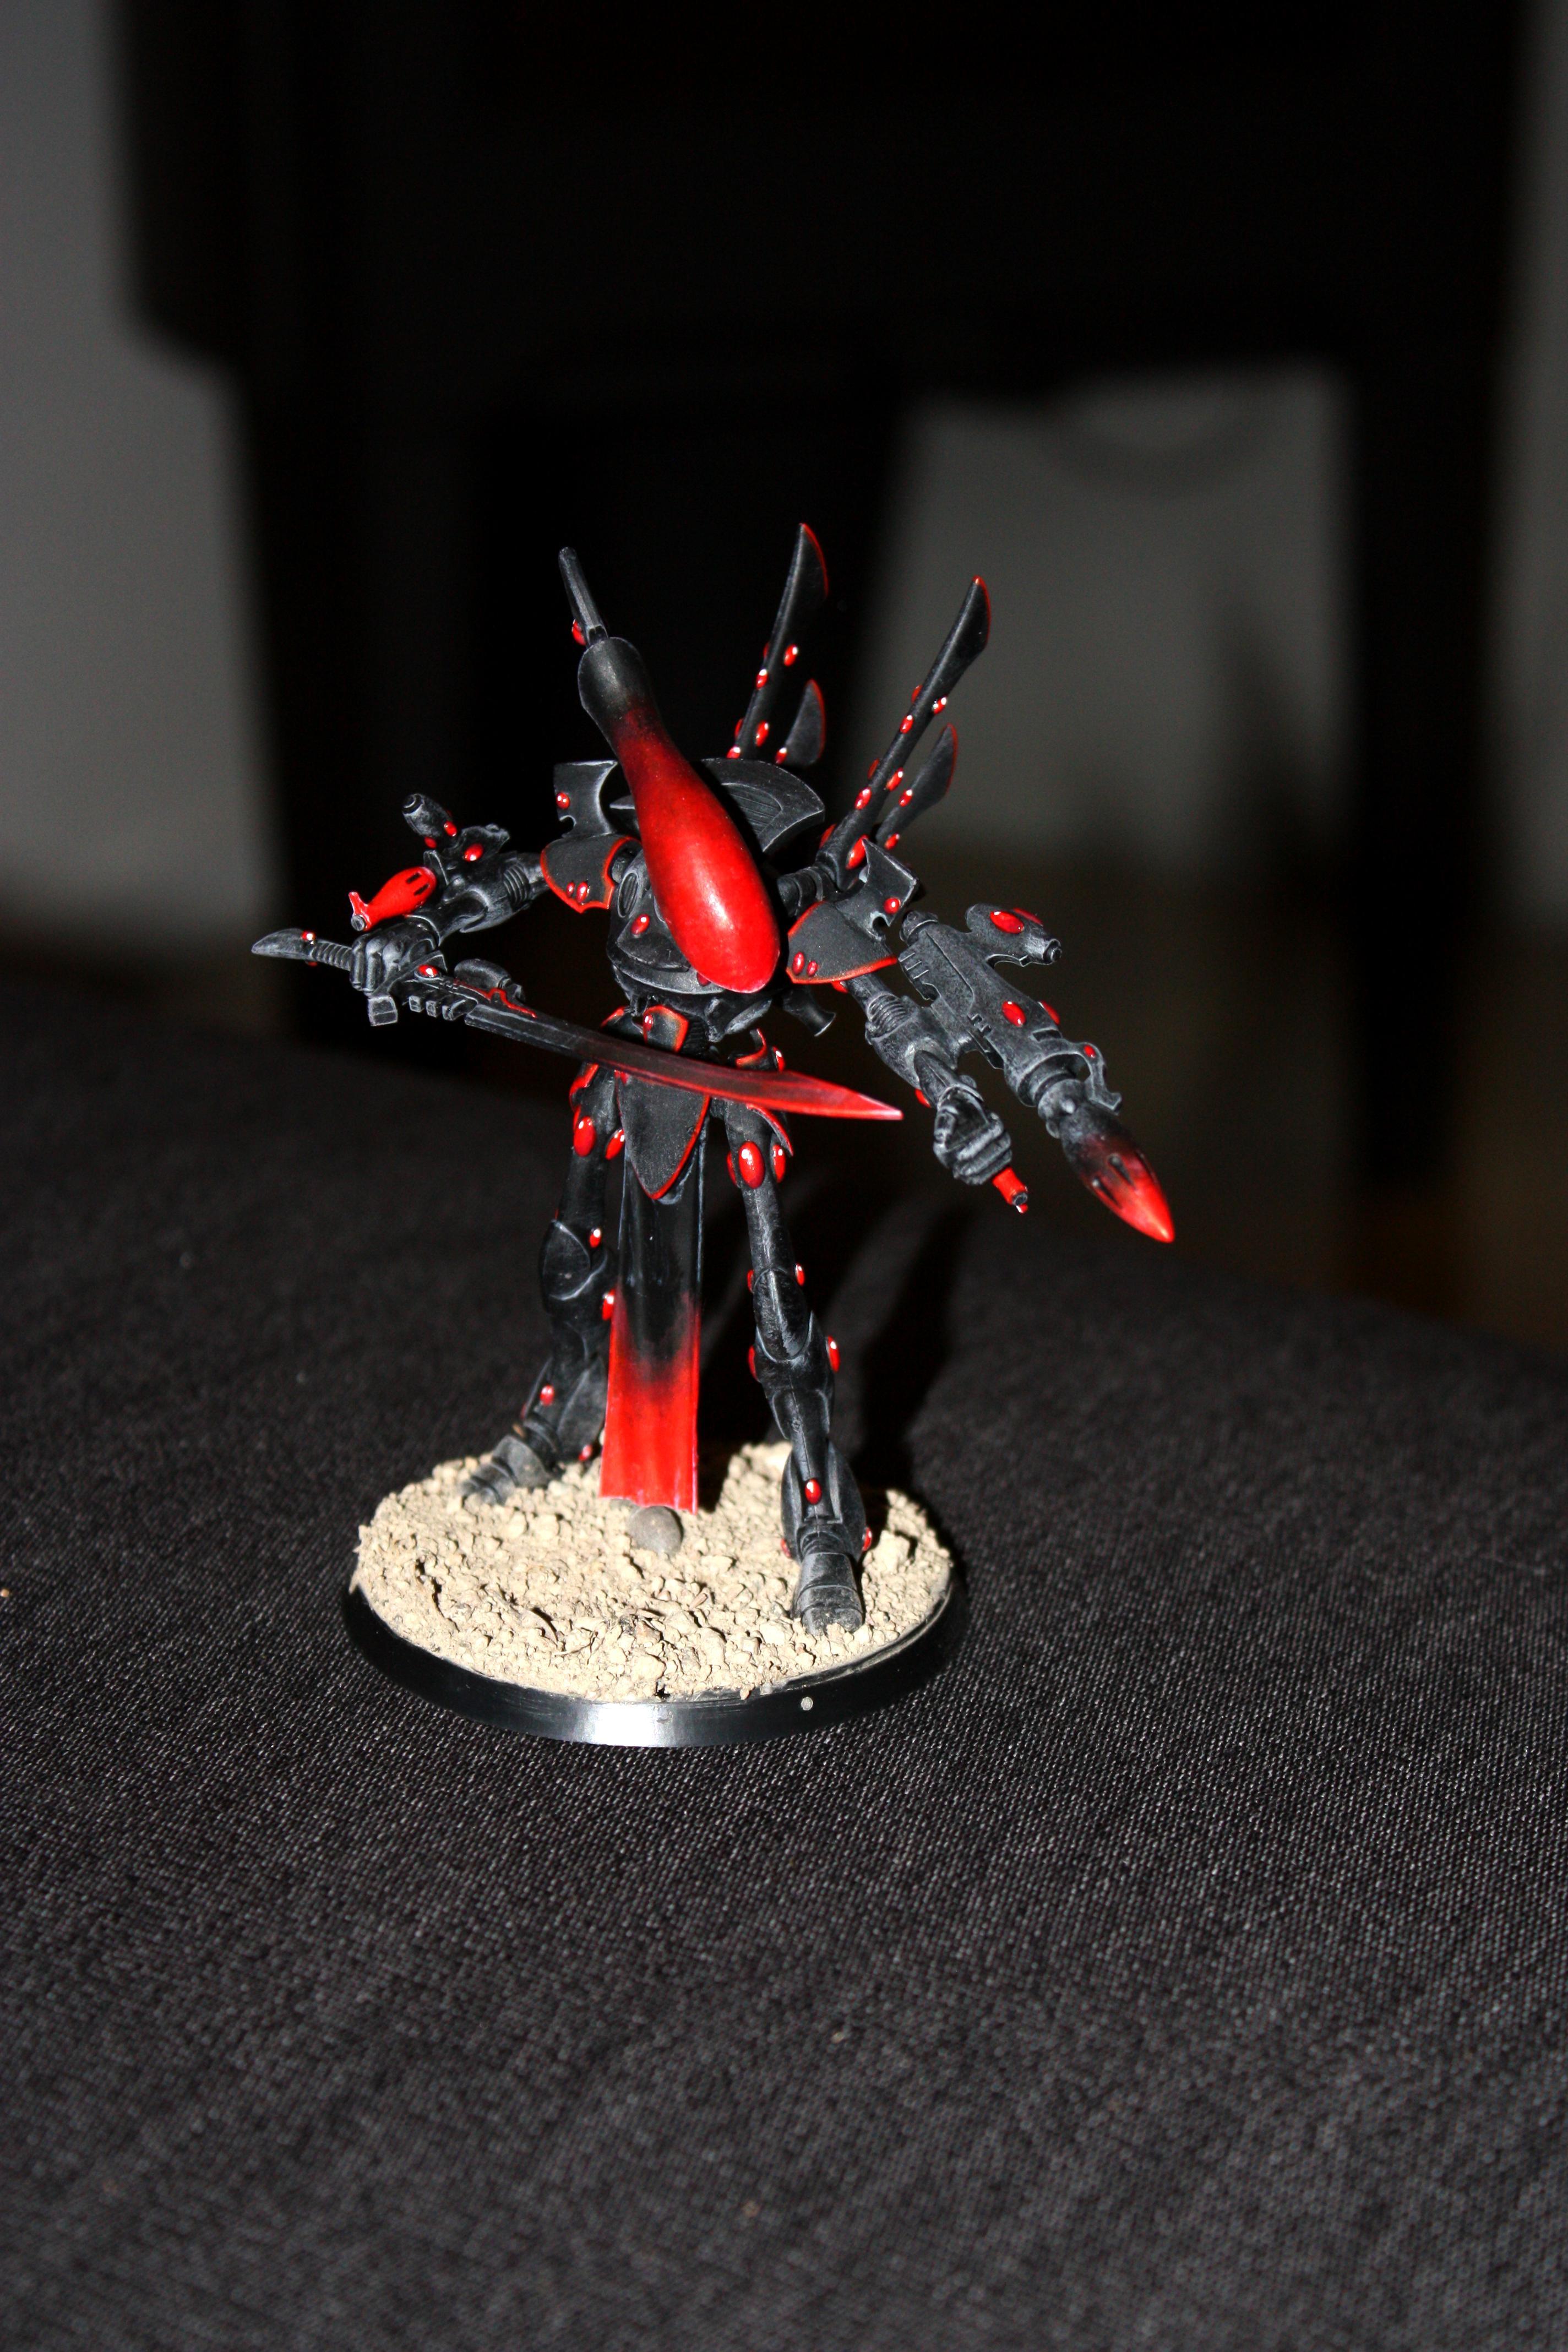 Drybrush, Eldar, Warhammer 40,000, Wraithlord